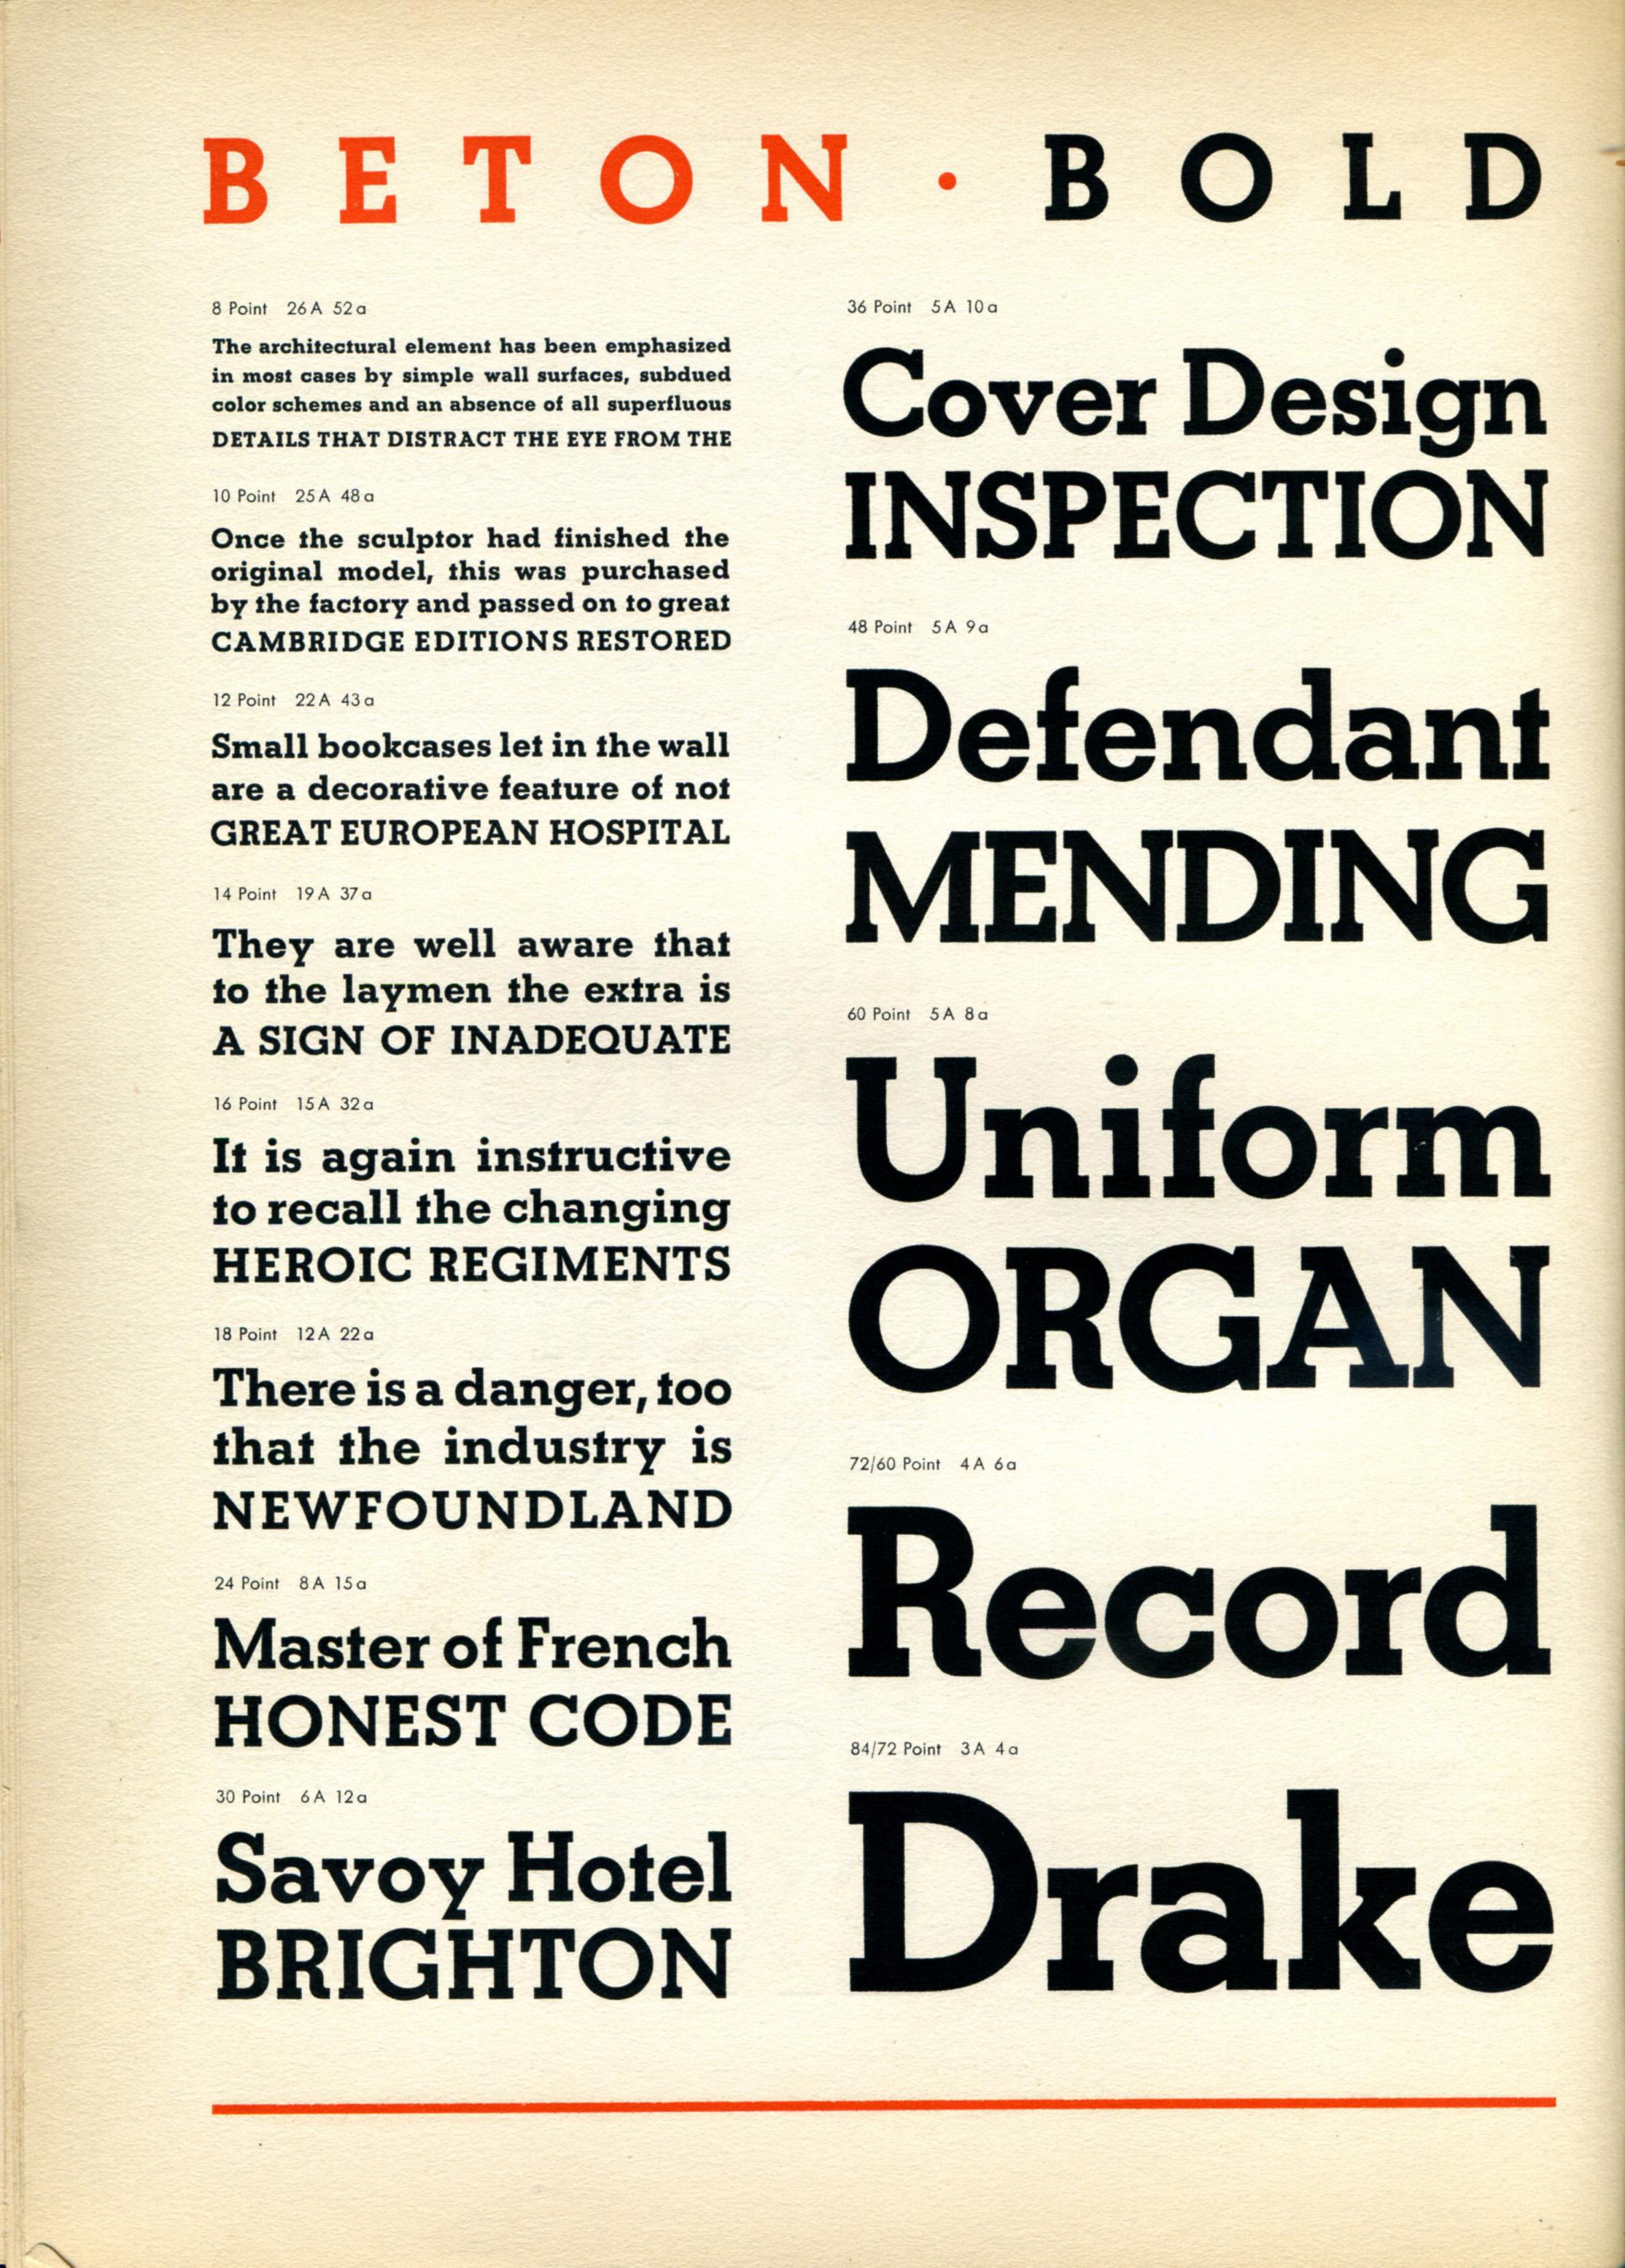 Neutraface slab bold font